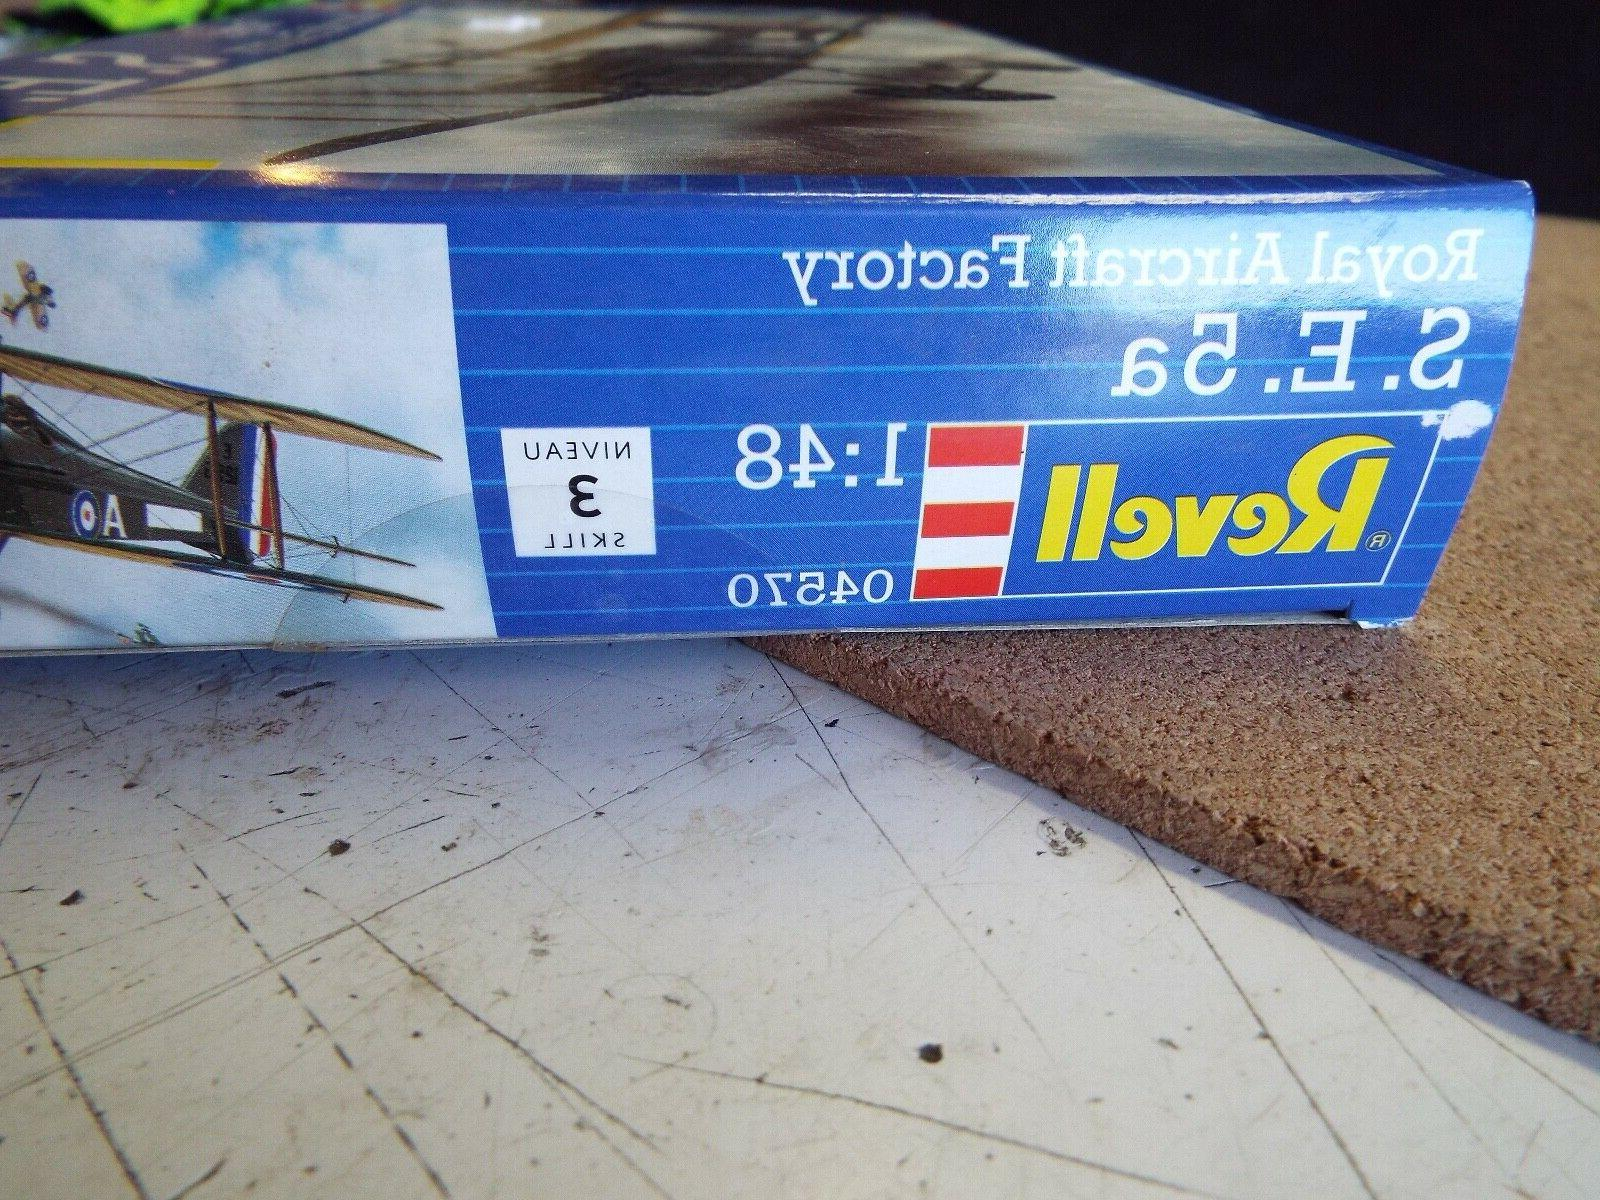 Revell 1:48 S.E. 5a Royal Aircraft Kit #04570